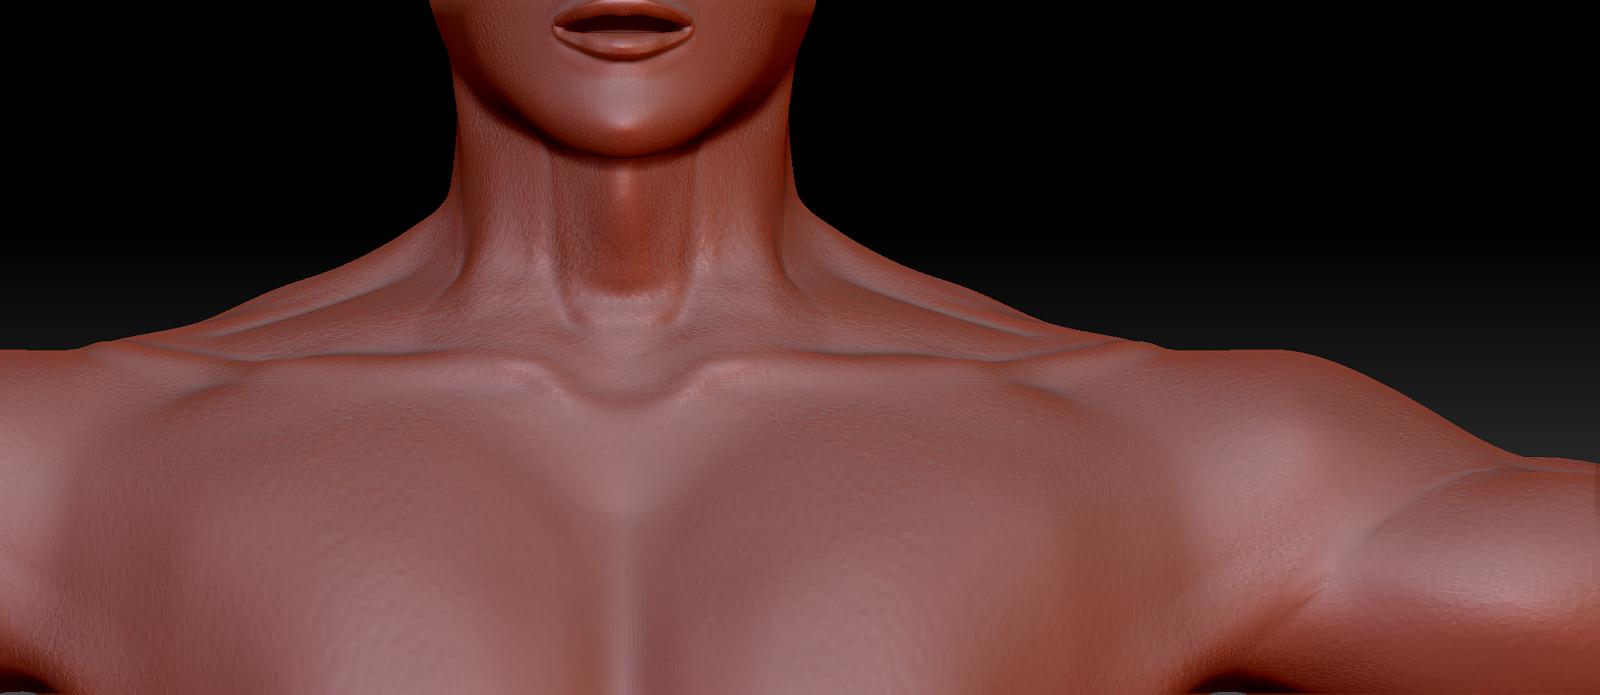 Zbrush anatomy study